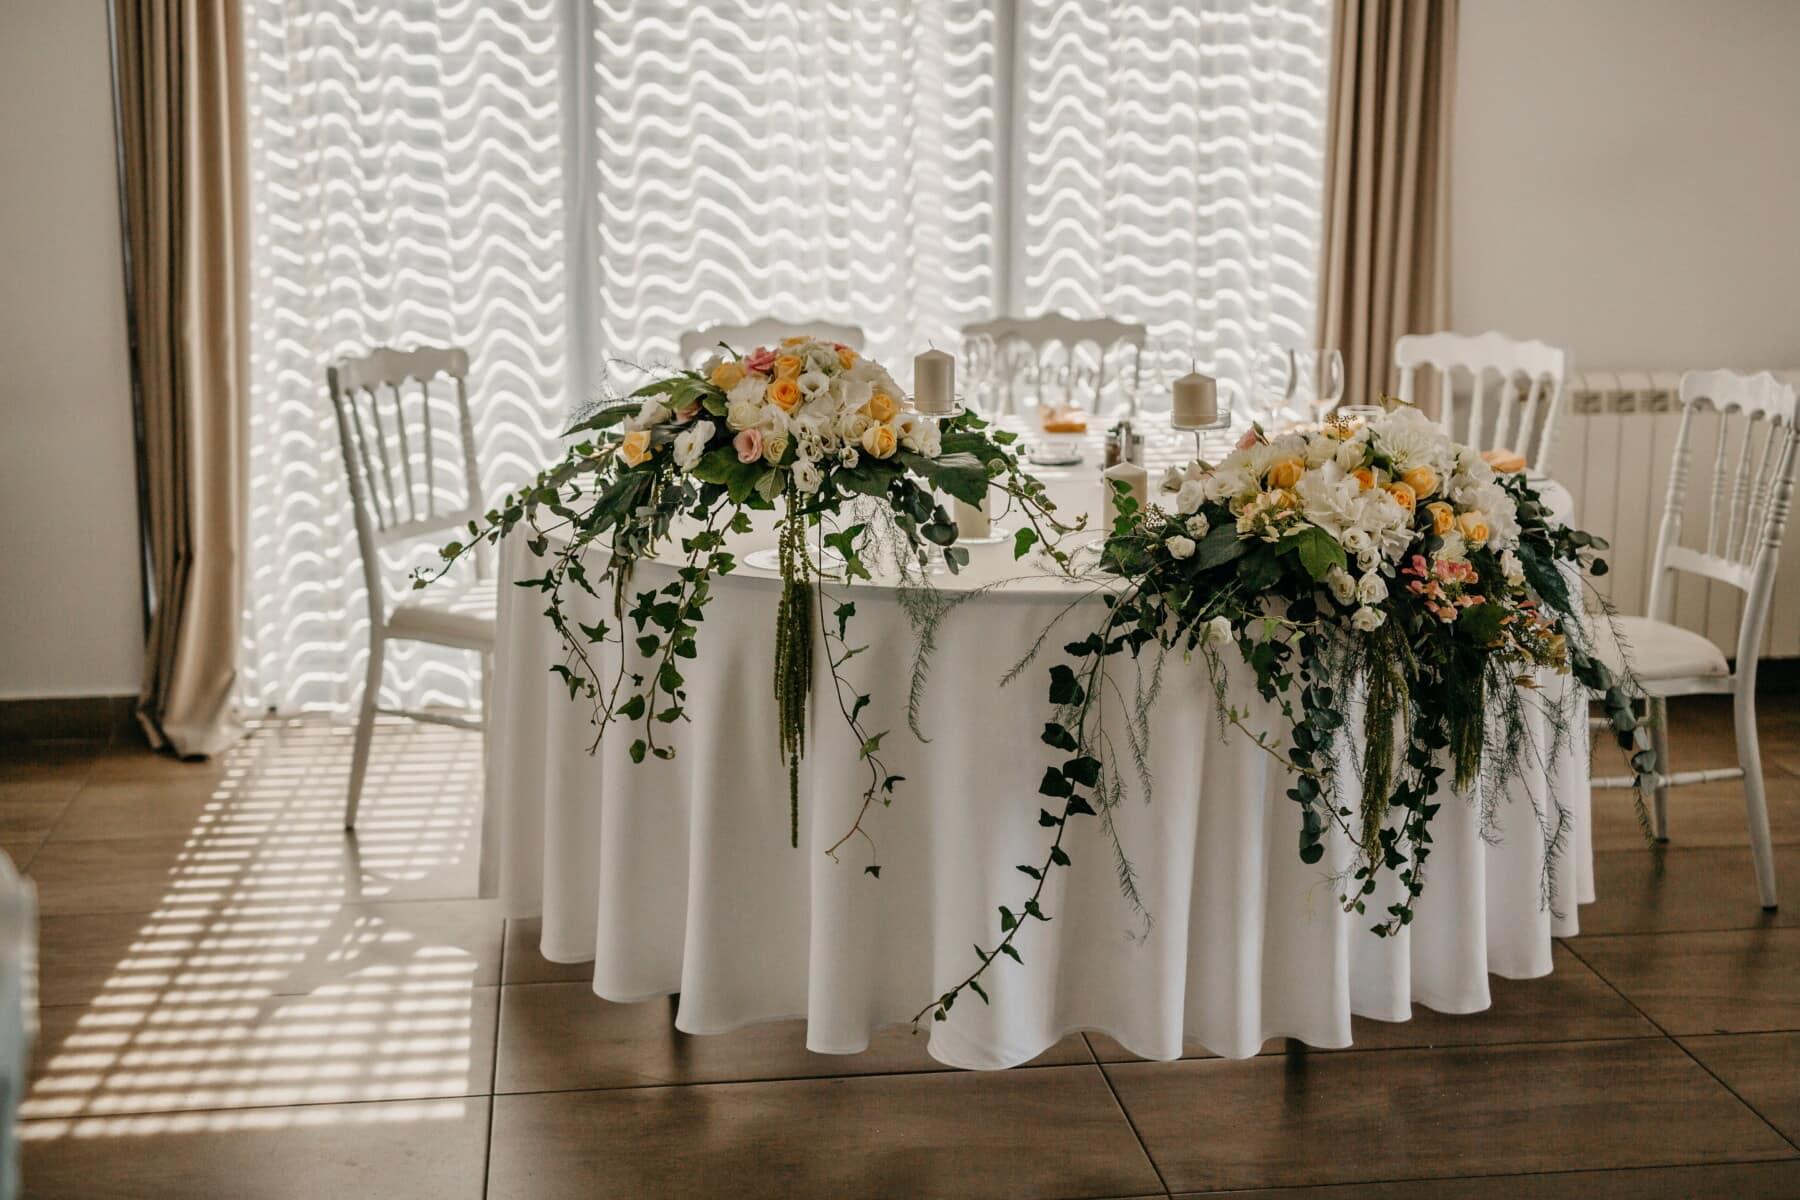 afternoon, interior design, lunchroom, interior decoration, shadow, elegance, comfort, chairs, floor, curtain